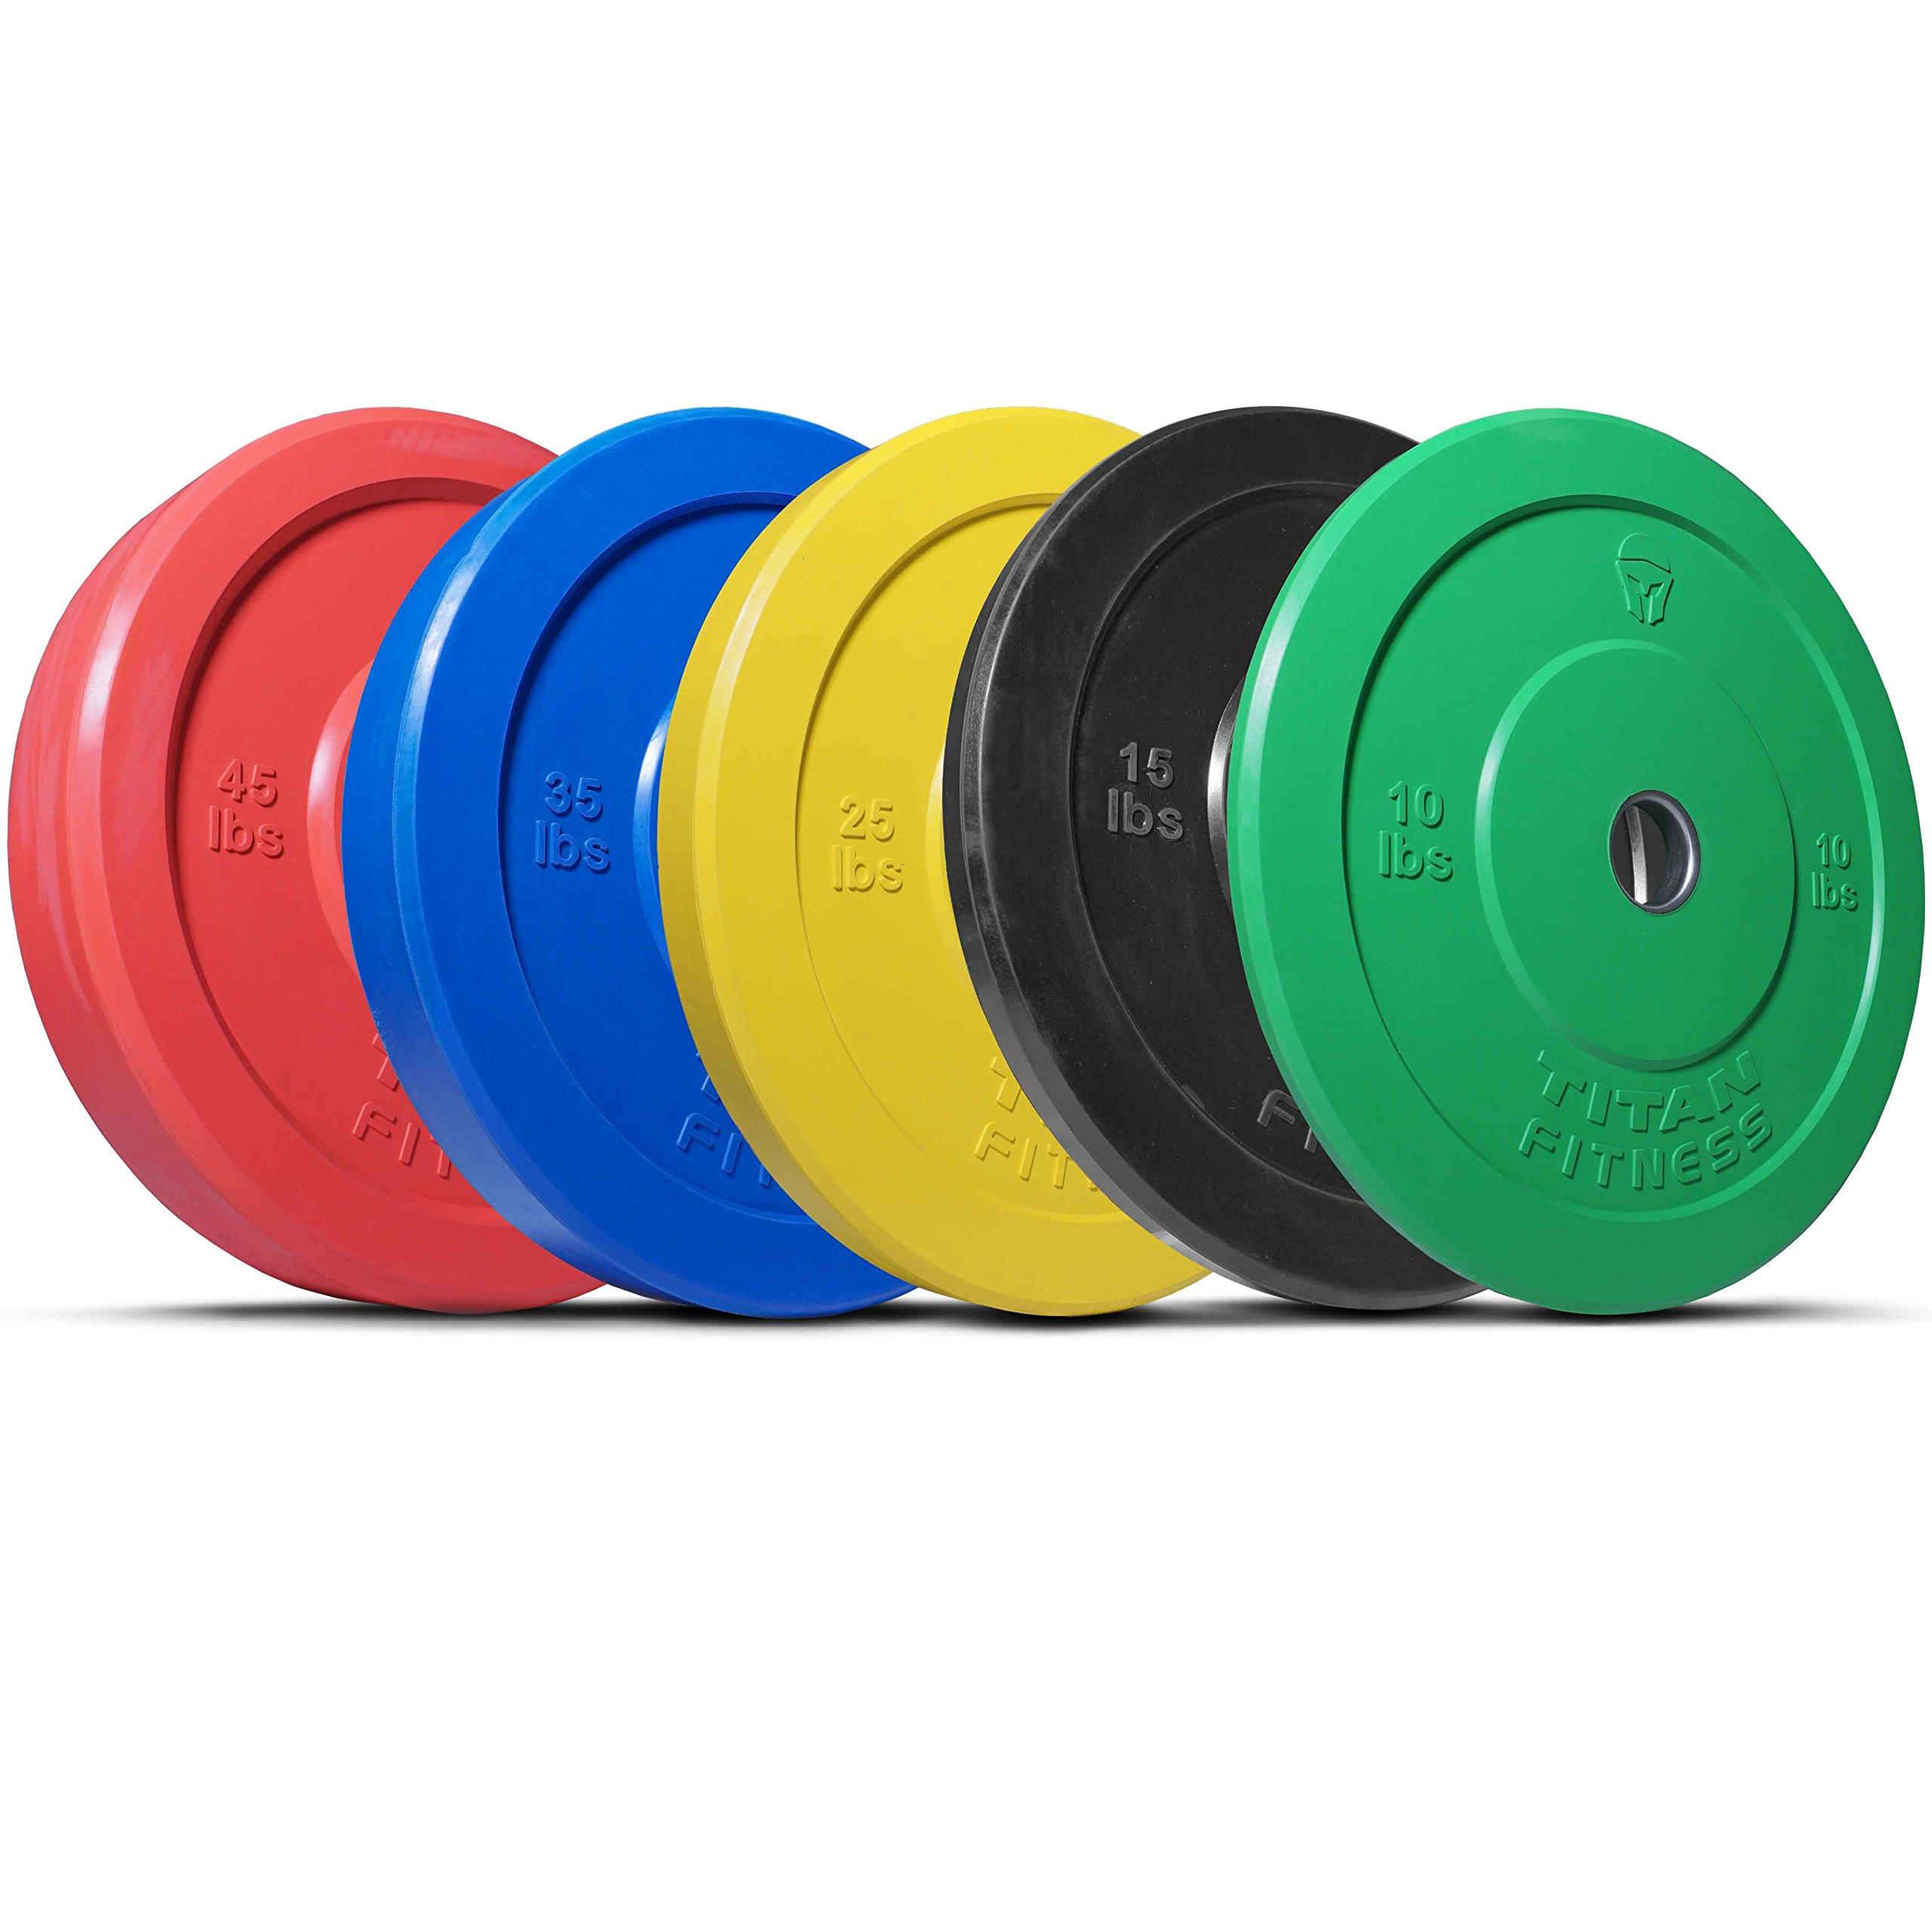 Titan 260 lb Set of Olympic Bumper Plates Benchpress Strength Training Power WOD